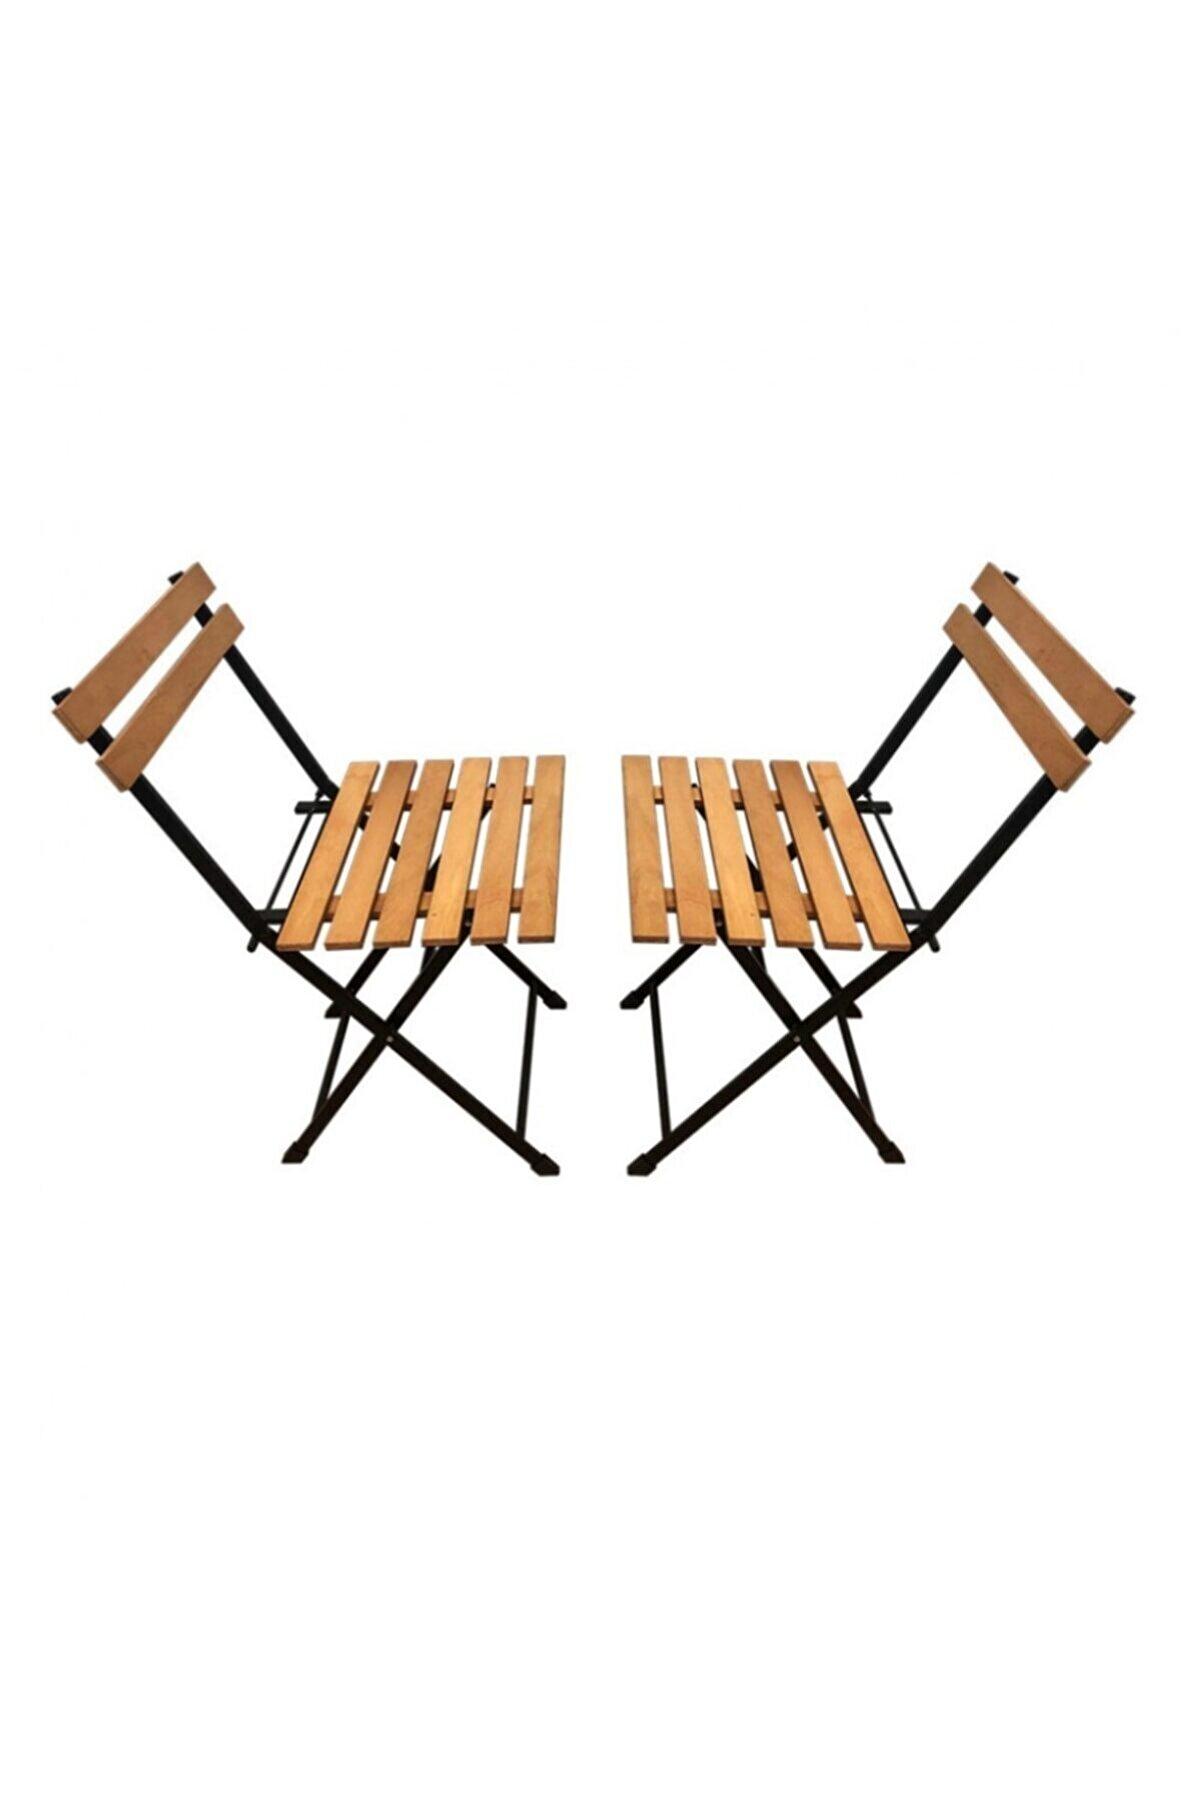 HEREVİM Balkon Bahçe Bistro Ceviz Çift Sandalye